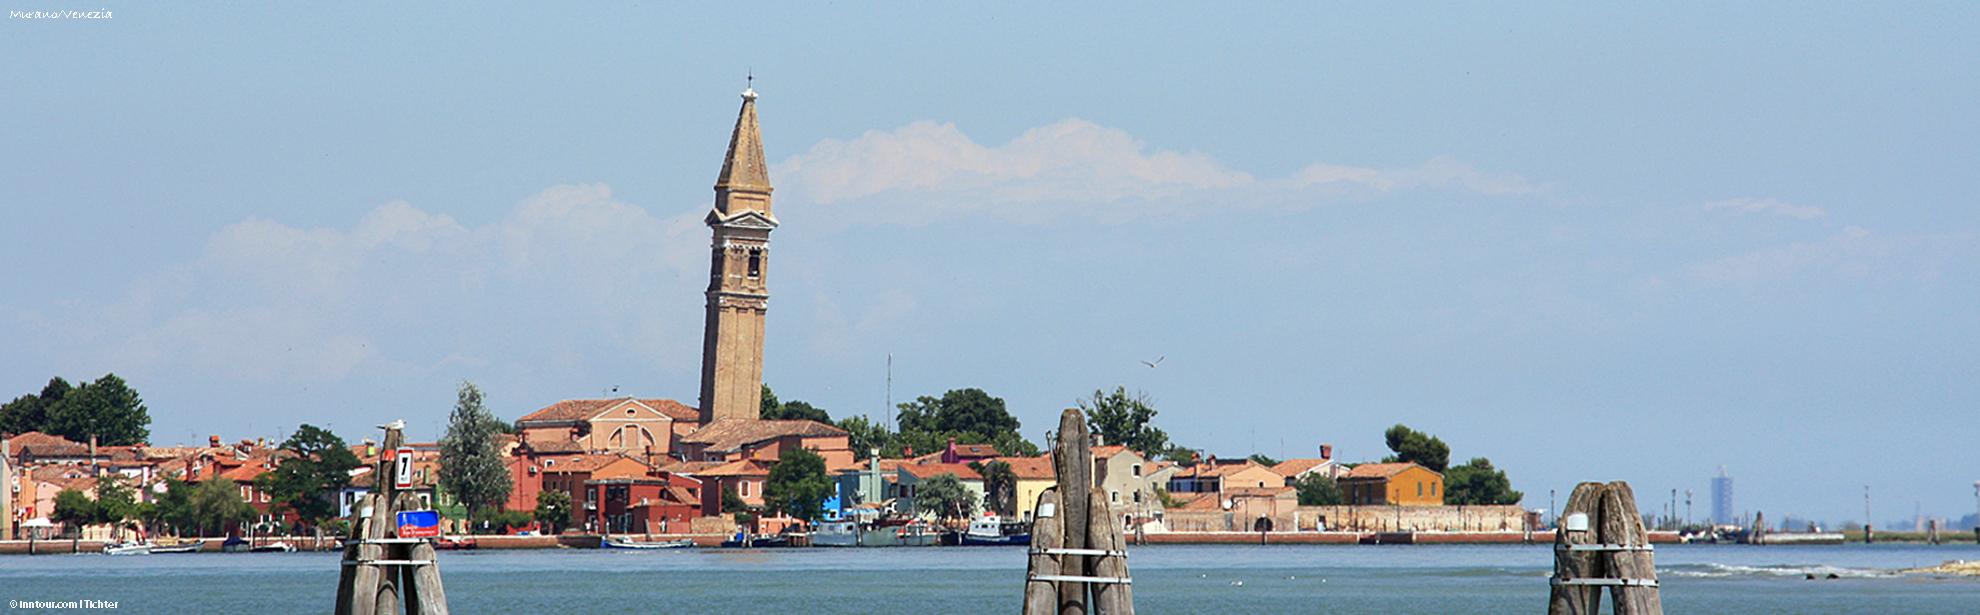 Osportinntour_Tichter_Murano-Venezia_IMG_3543